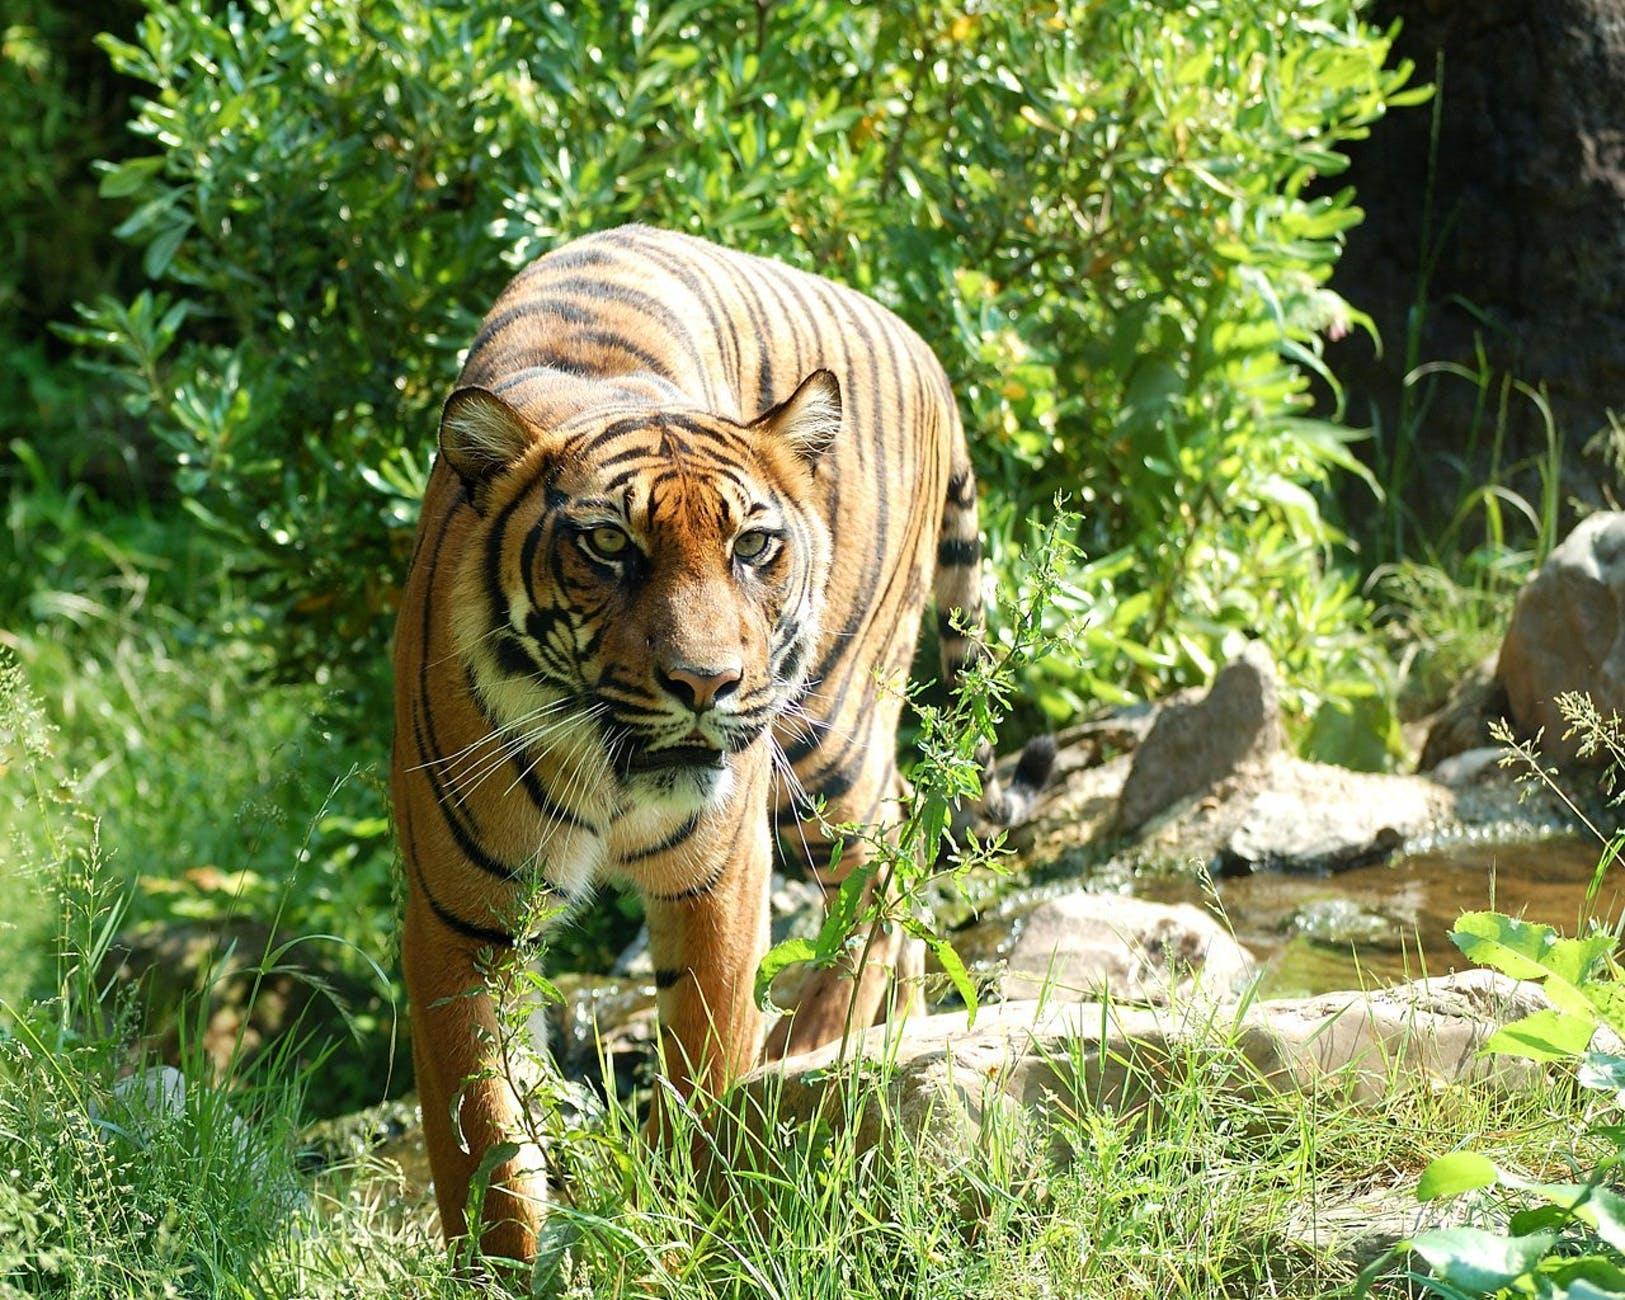 tiger-sumatran-tiger-cat-predator-87415.jpeg